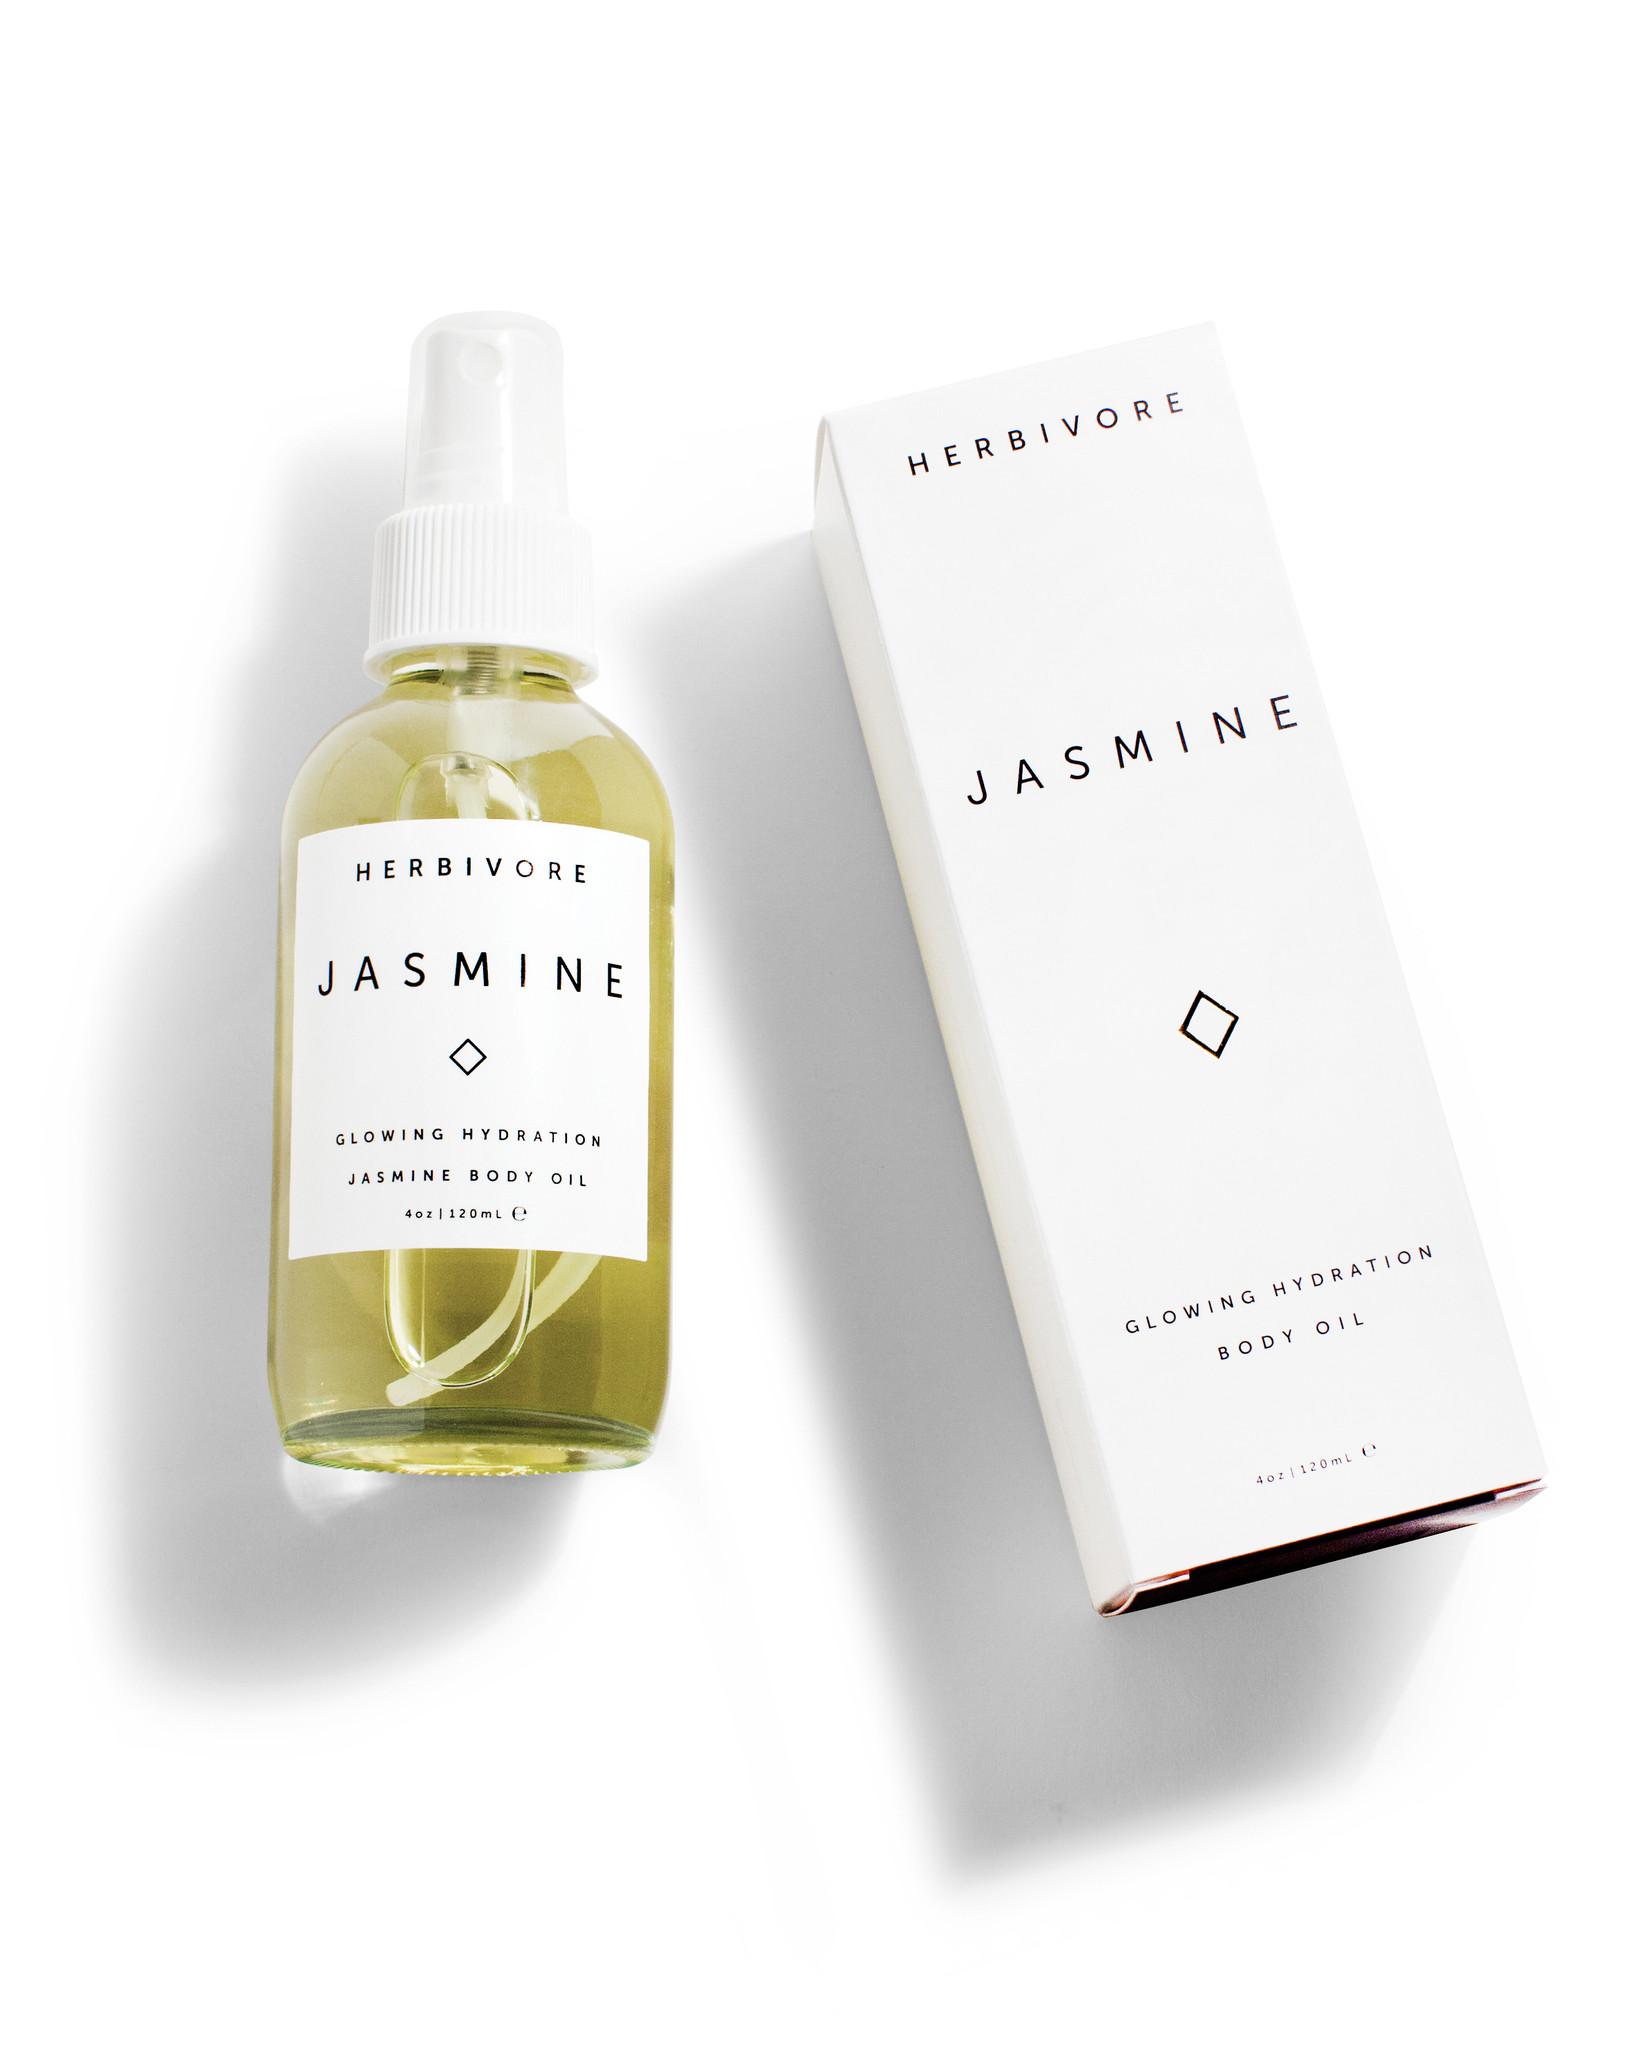 herbivore-jasmine-body-oil.jpg